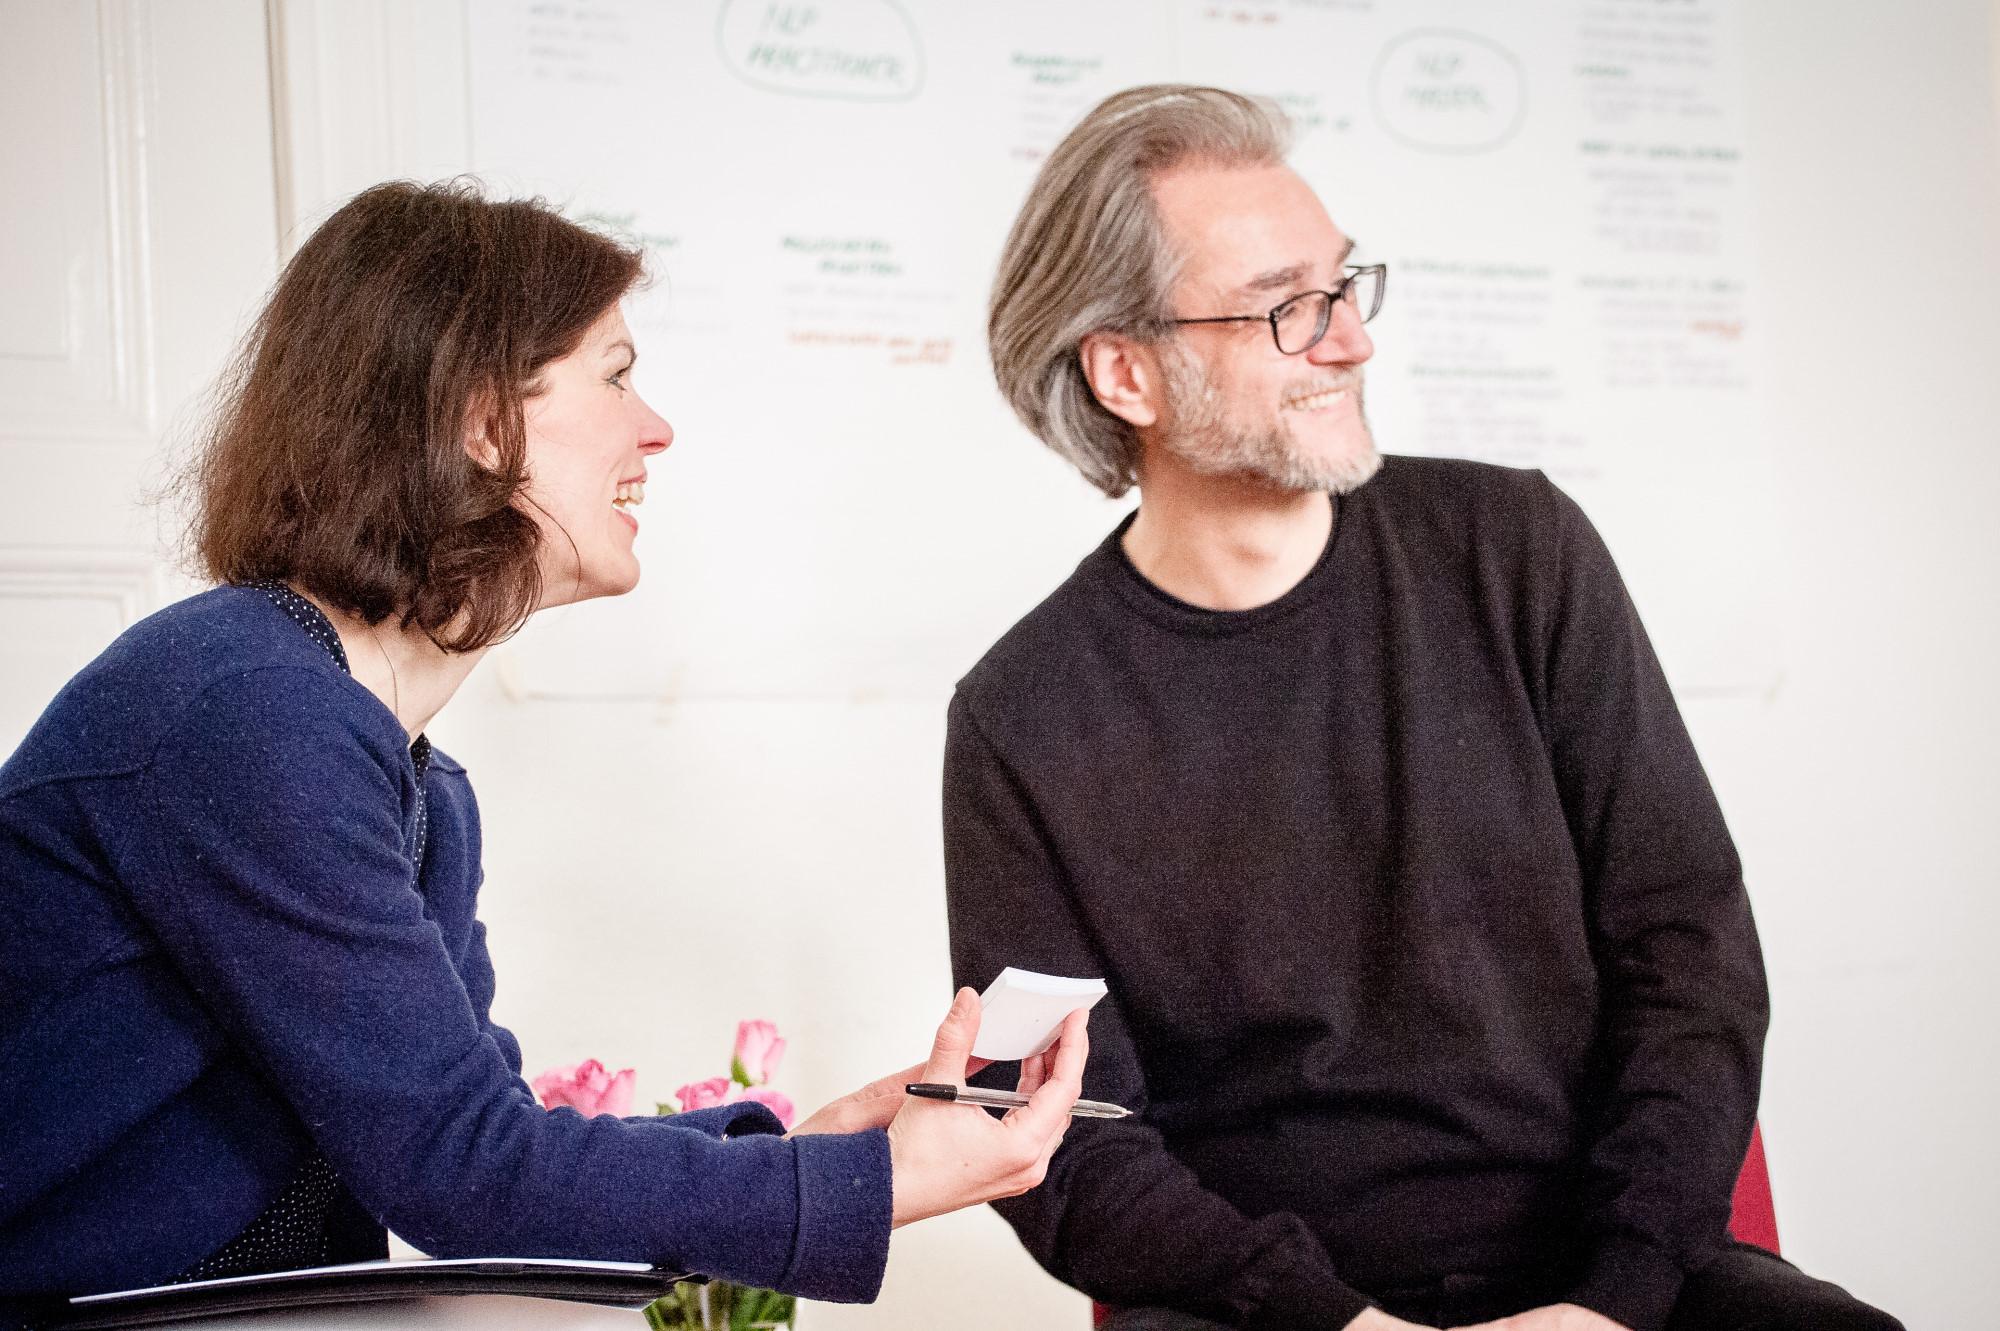 Ausbildung Design Berlin nlp master ausbildung dvnlp in berlin ralf stumpf seminare